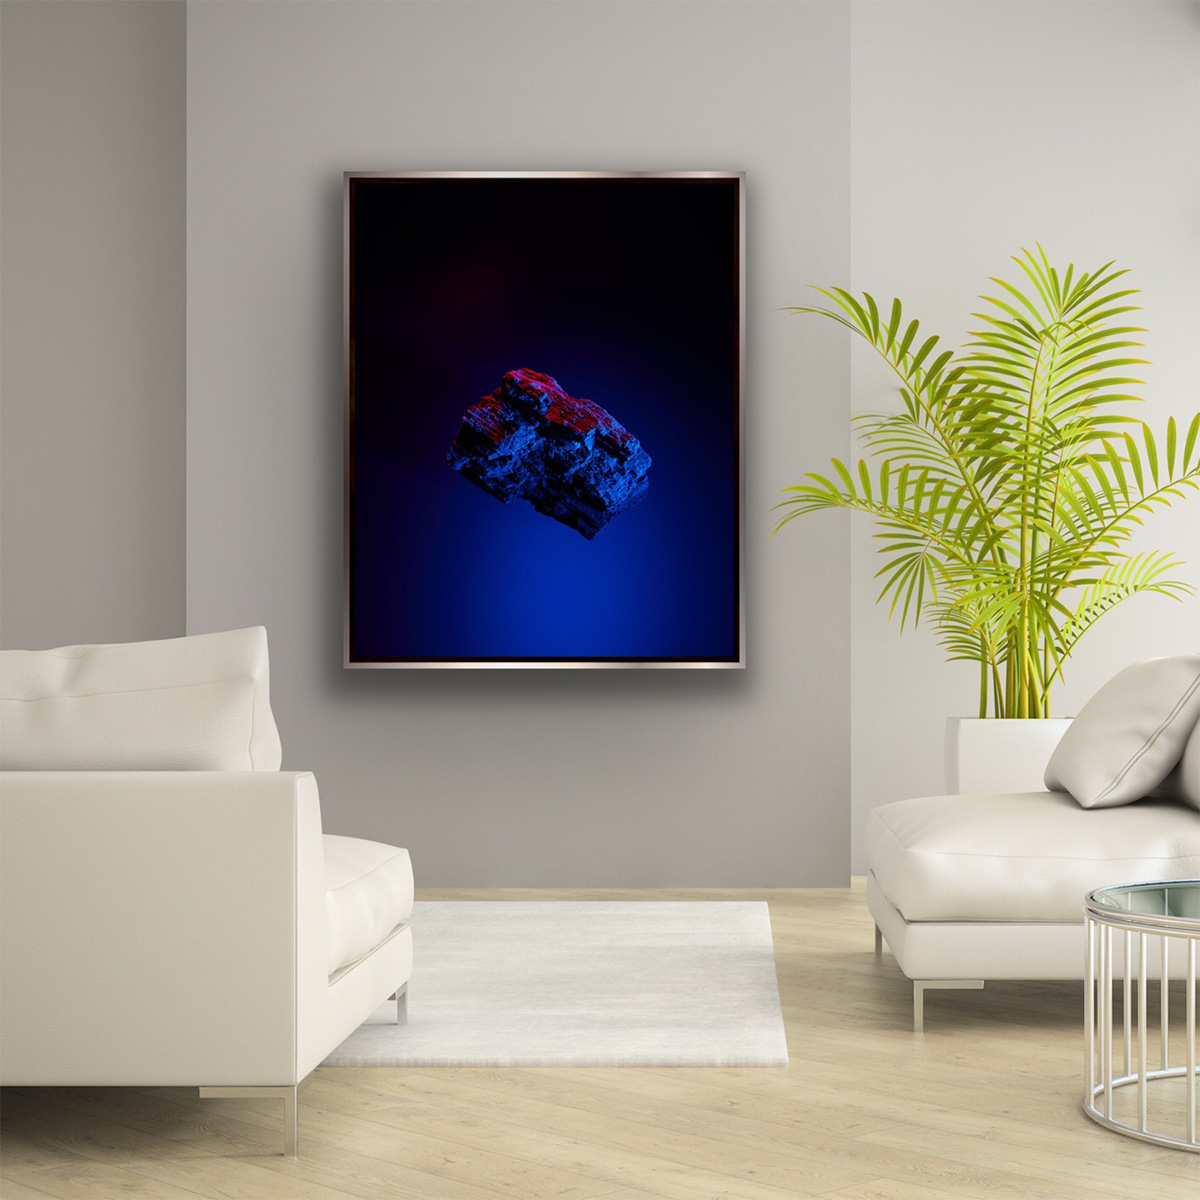 ROBUR by Grete Hjorth-Johansen, viewed in a room